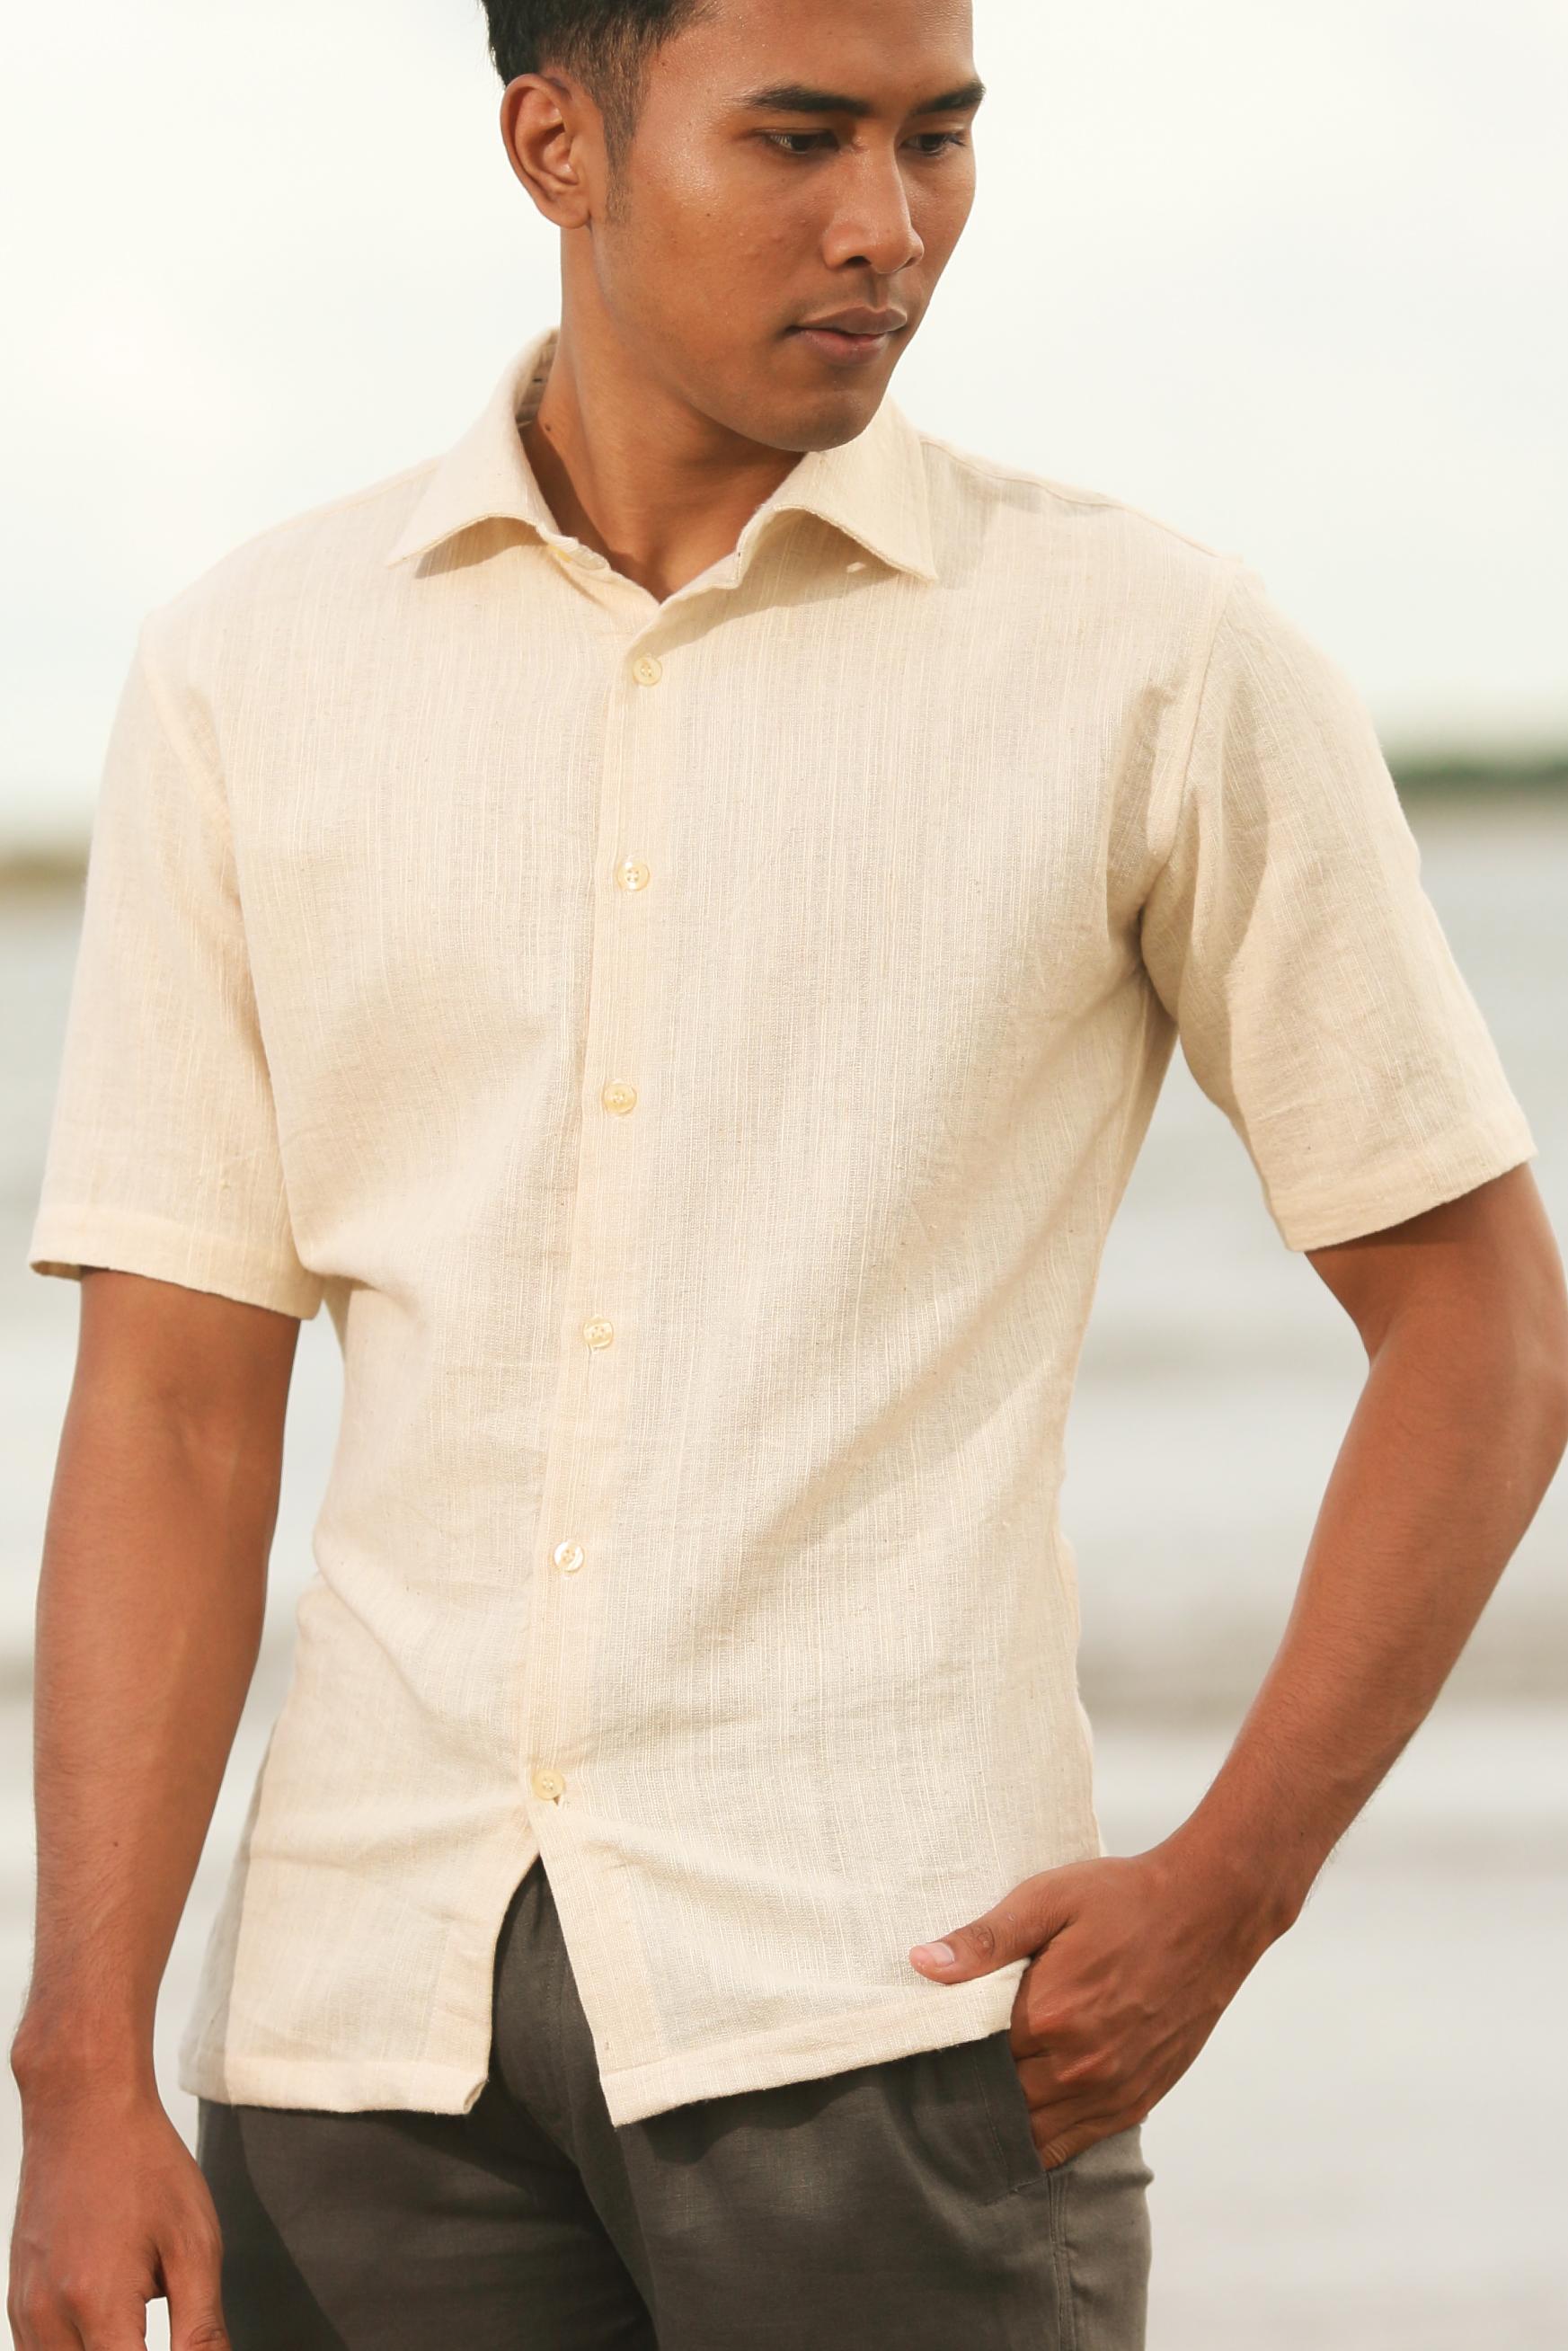 Men's Organic Cotton Short Sleeve Italian Natural Shirt